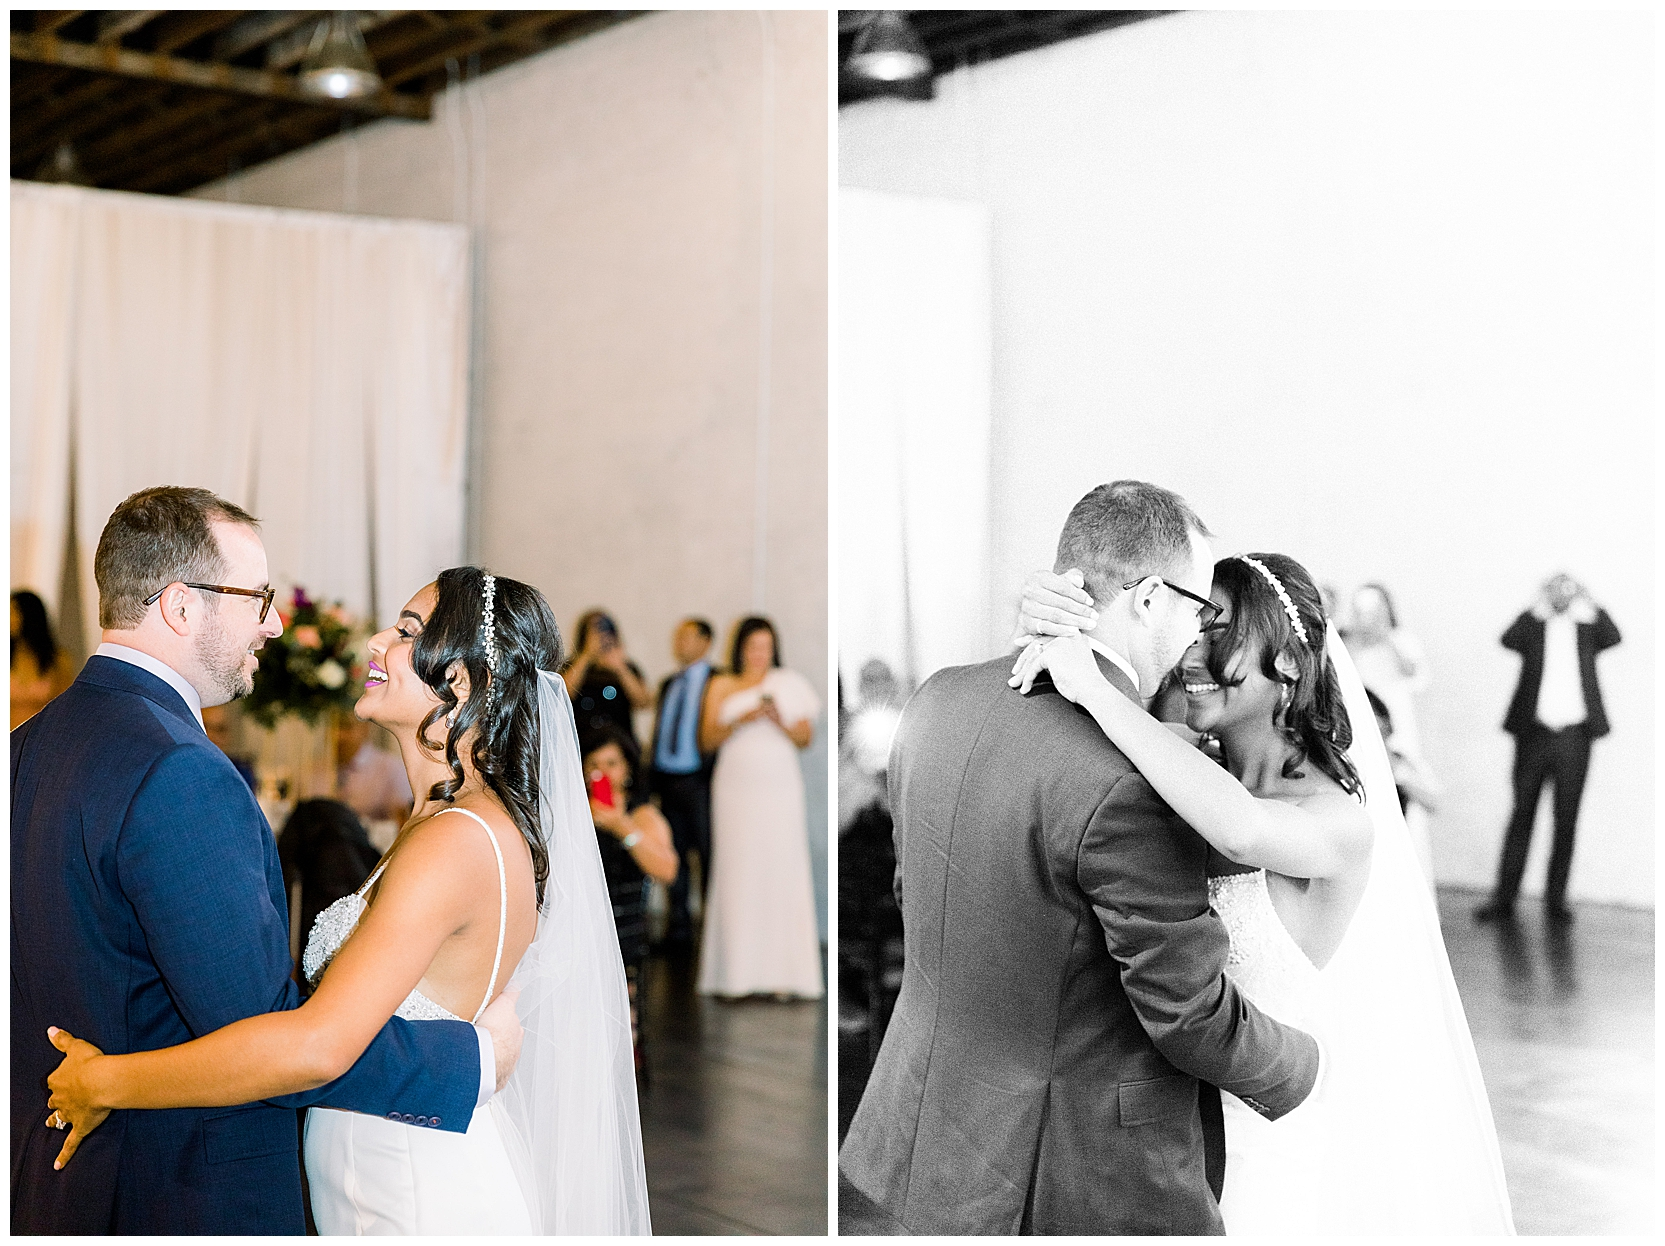 jessicafredericks_lakeland_tampa_wedding_purple_crazy hour_0072.jpg